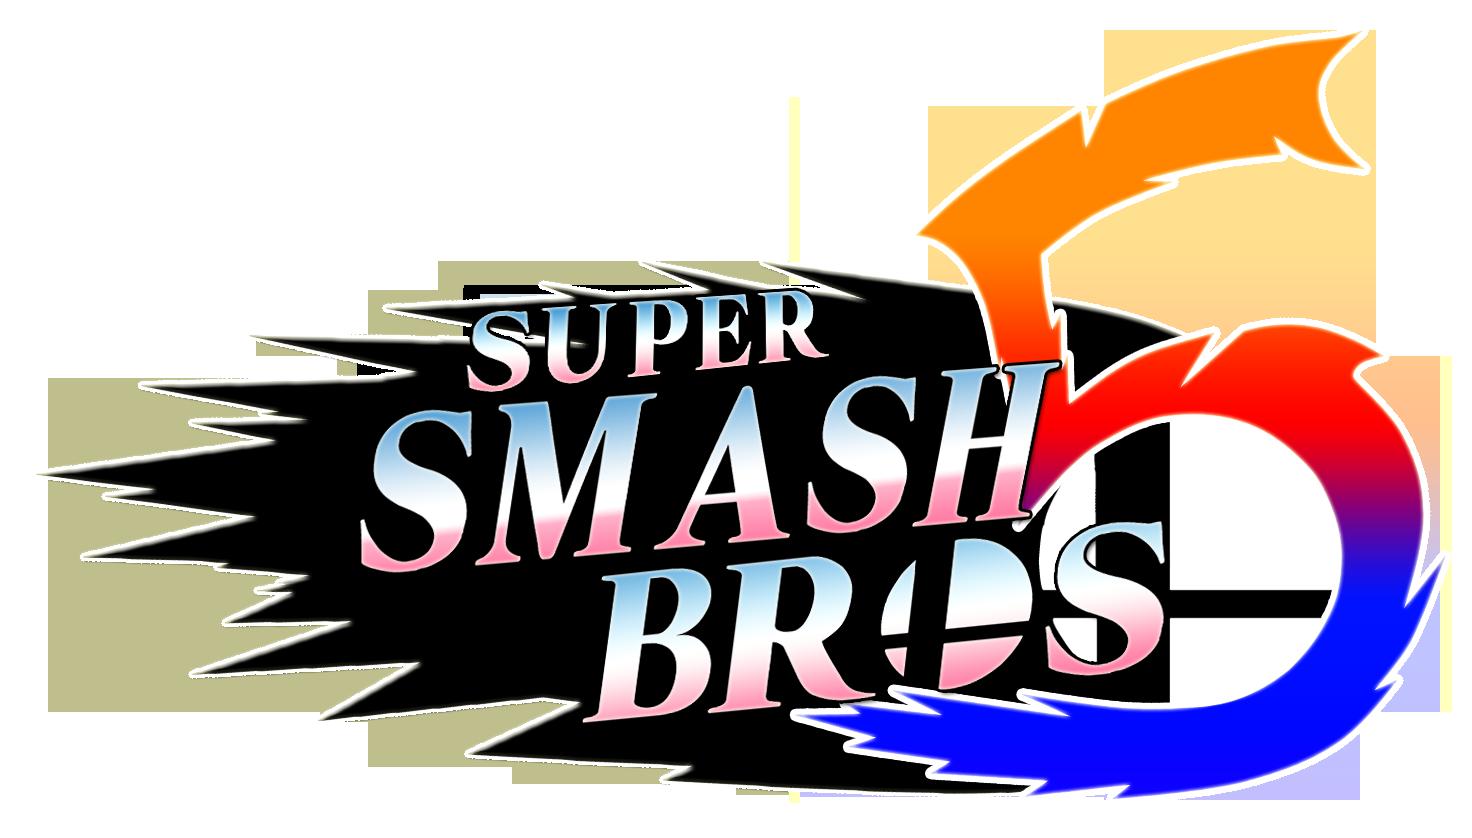 Super Smash Bros 5 Fan Logo by Alex13Art on DeviantArt